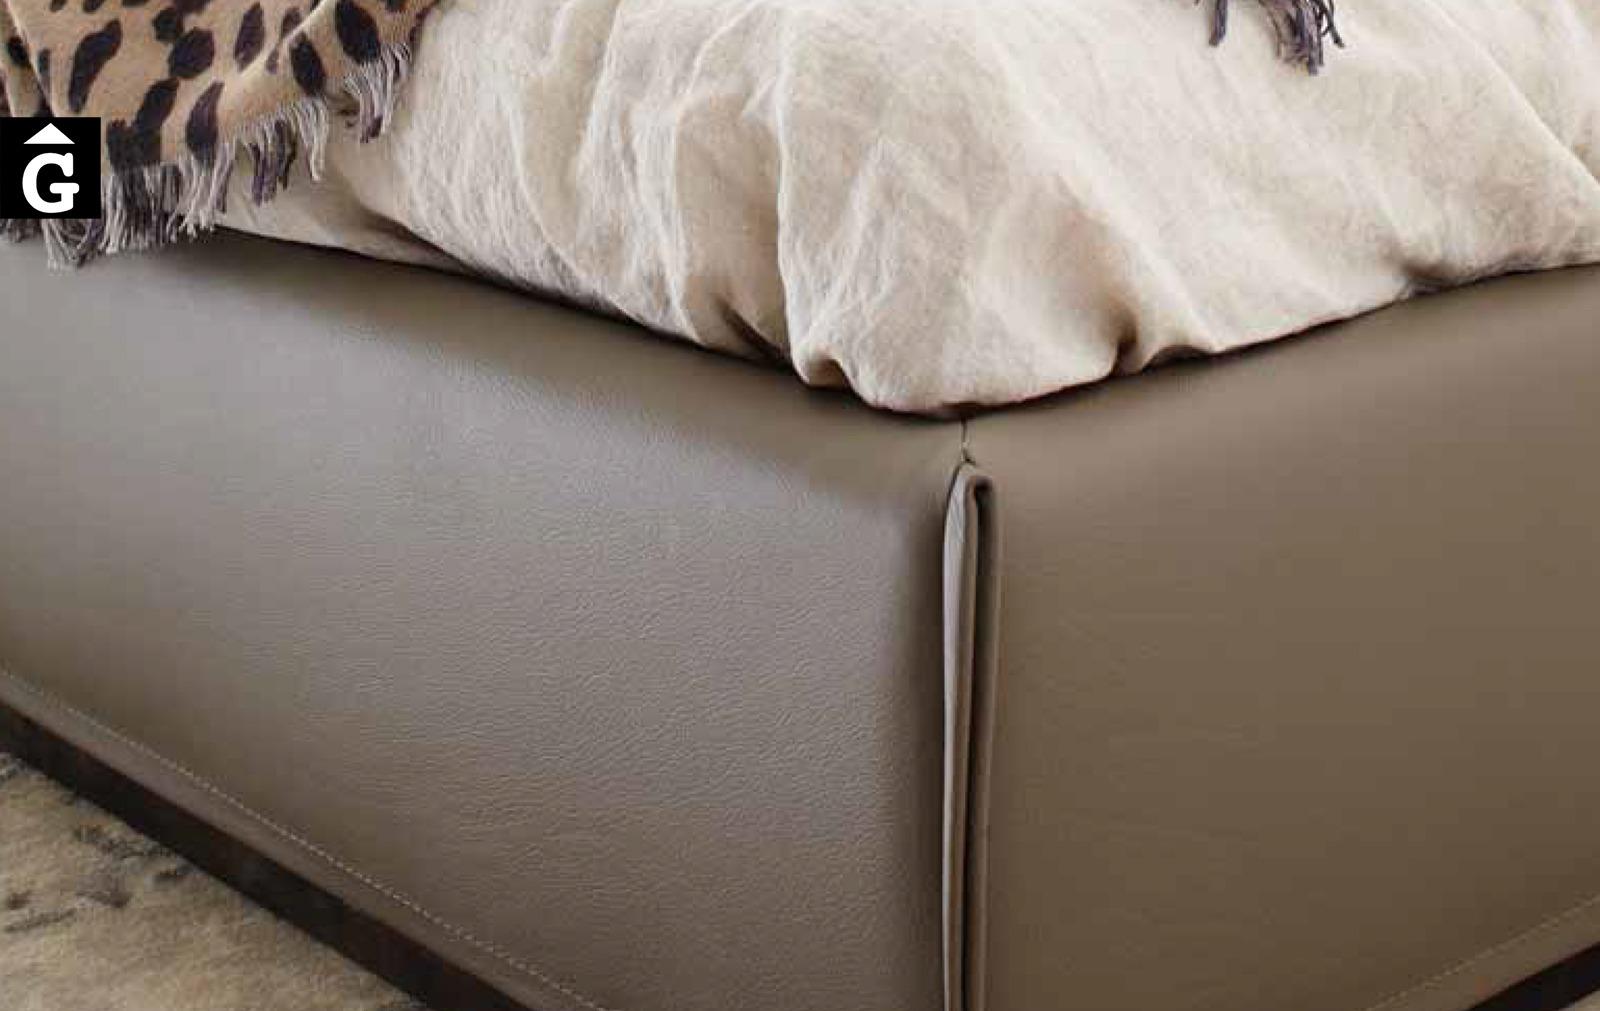 35 0 Grandanlogo detall aro llit entapissat – Ditre Italia llits entapissats disseny i qualitat alta by mobles Gifreu